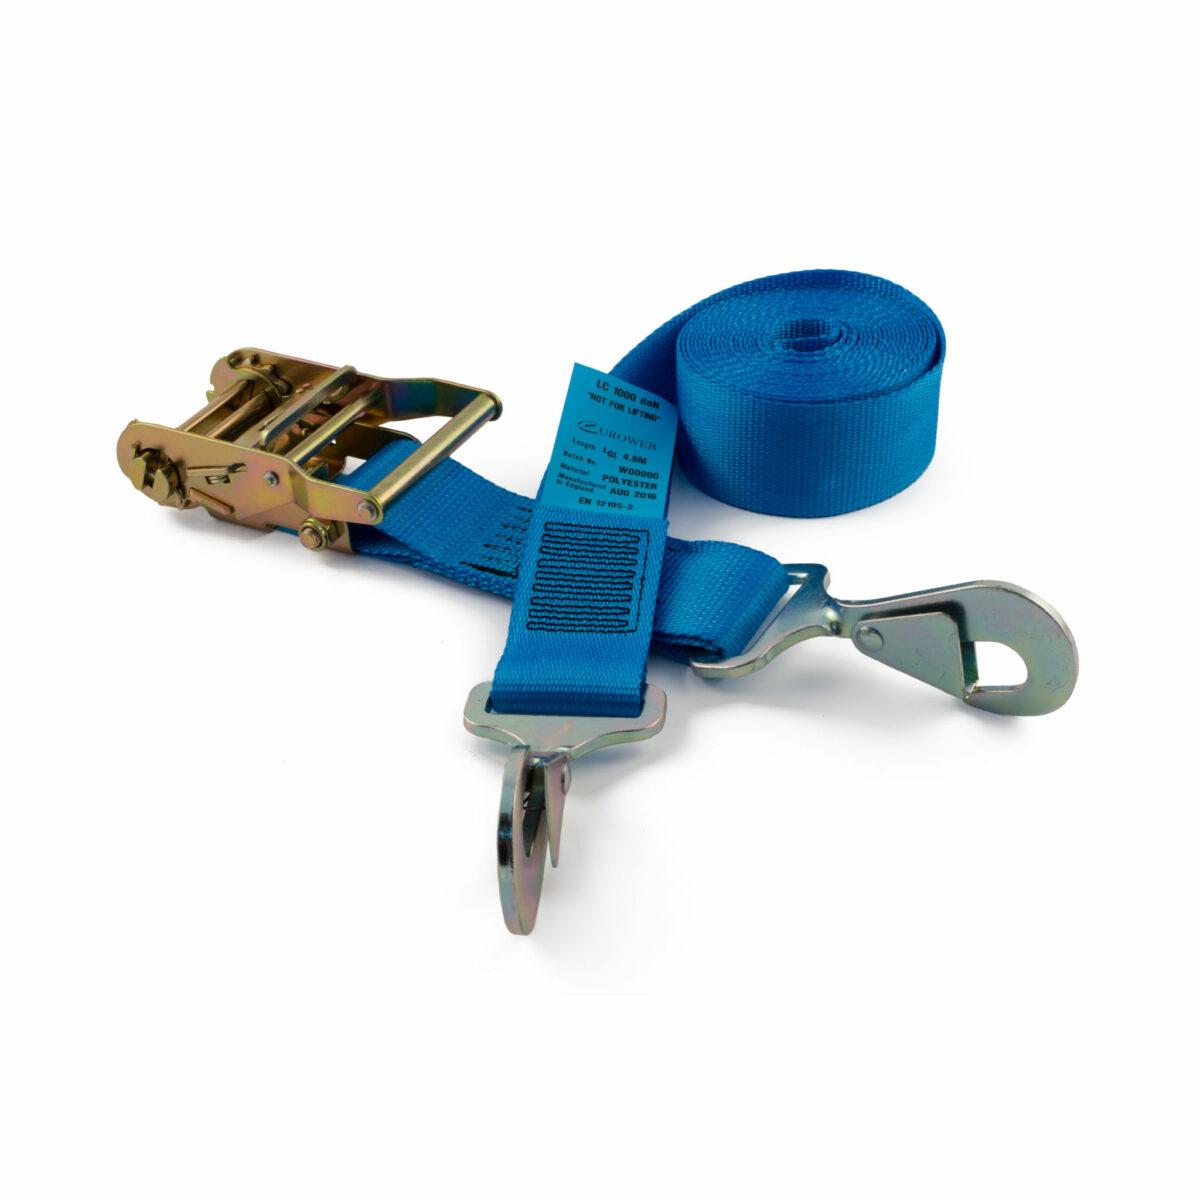 50mm ratchet straps with twisted snap hooks rated to 2000kg gtf. Black Bedroom Furniture Sets. Home Design Ideas